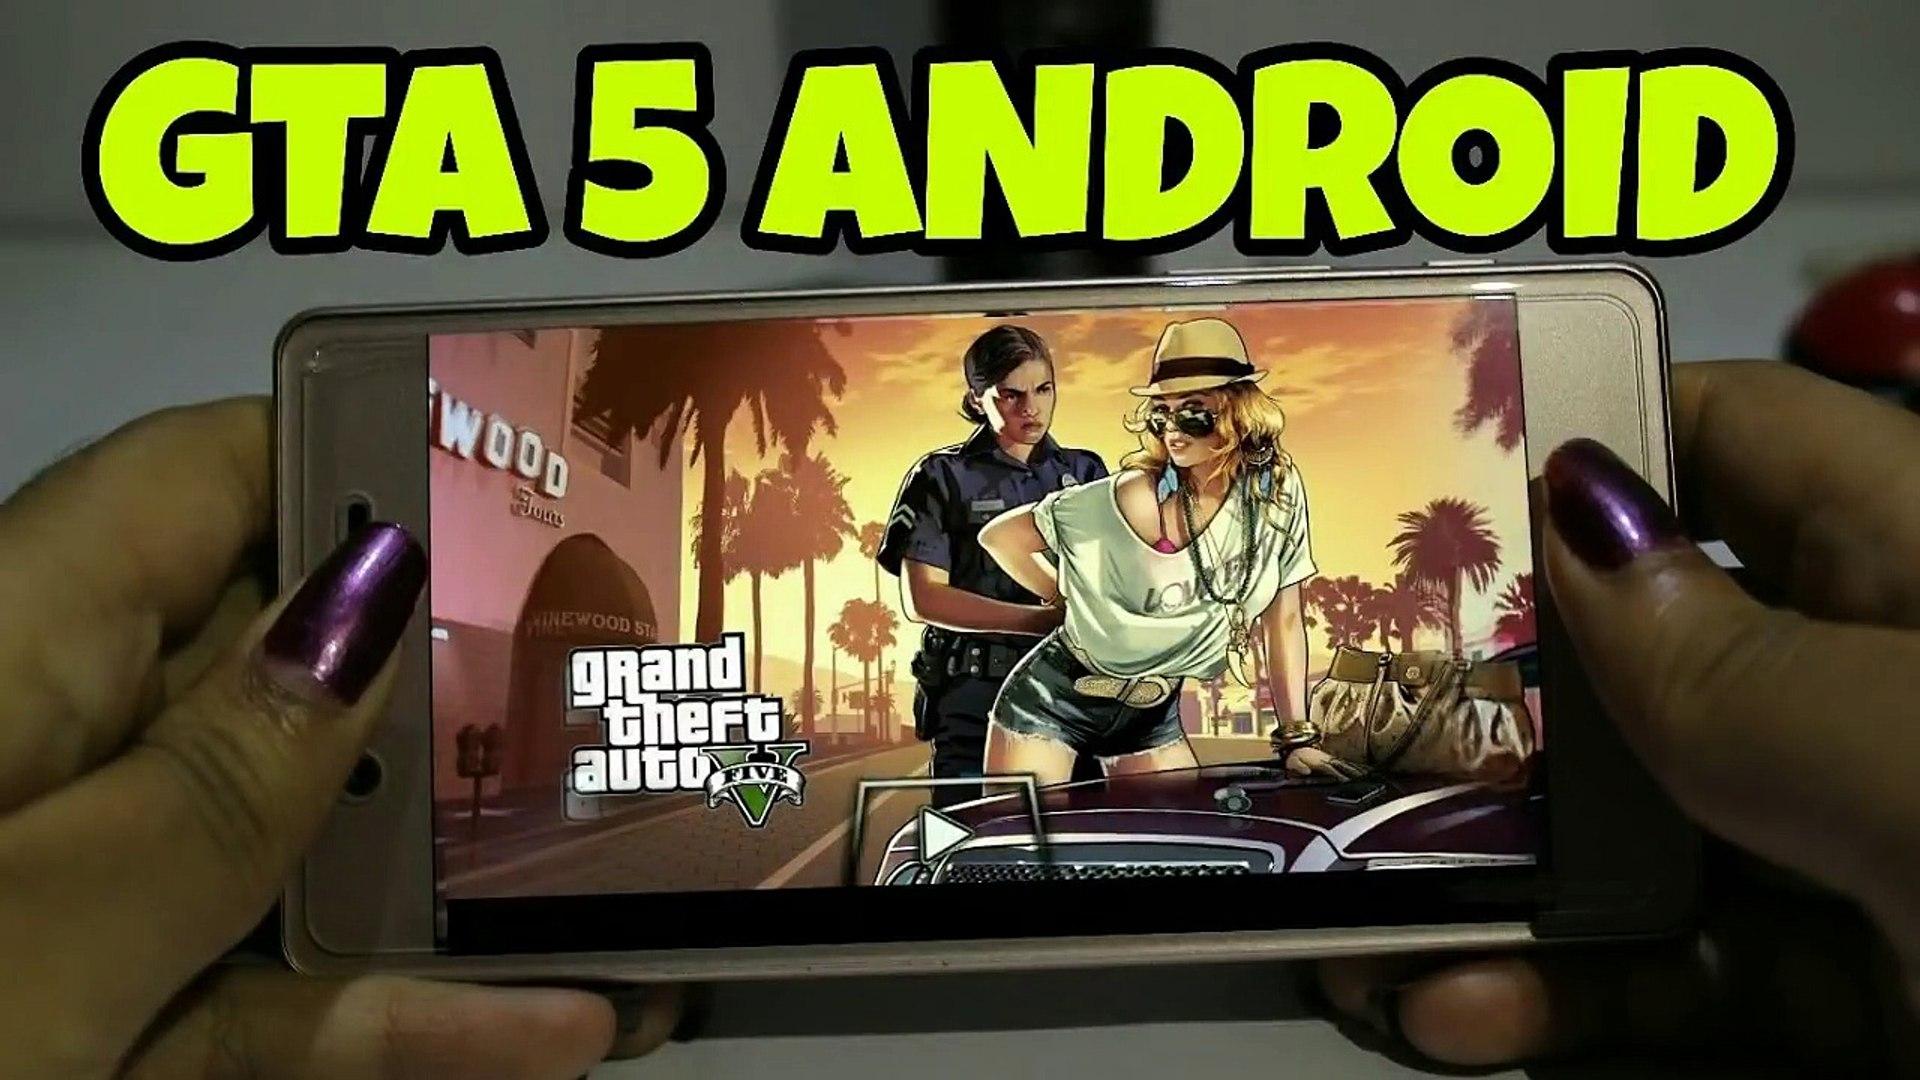 gta 5 game download on mobile